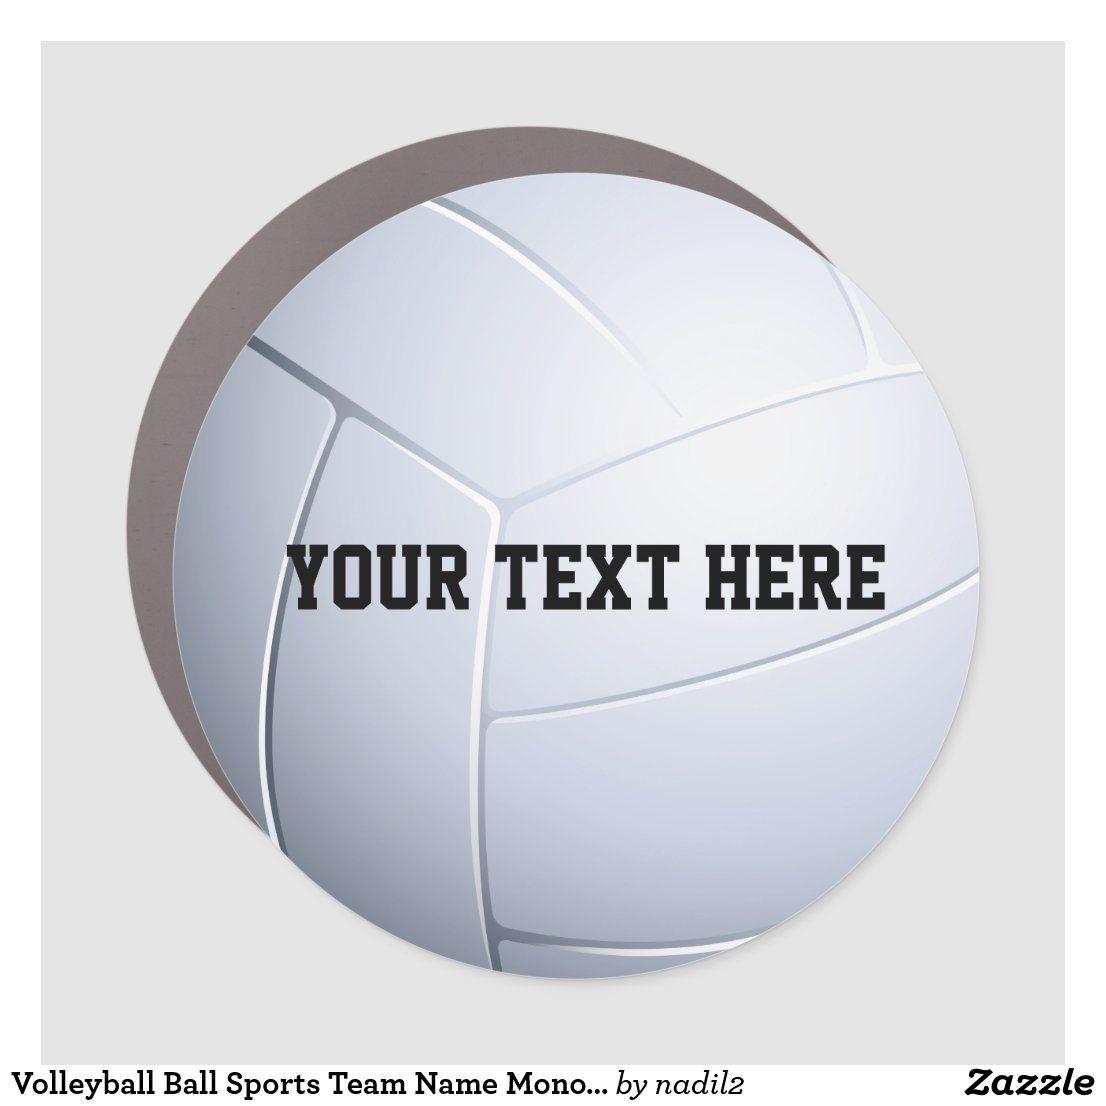 Volleyball Ball Sports Team Name Monogram Car Magnet Zazzle Com Team Names Sports Team Car Magnets [ 1106 x 1106 Pixel ]